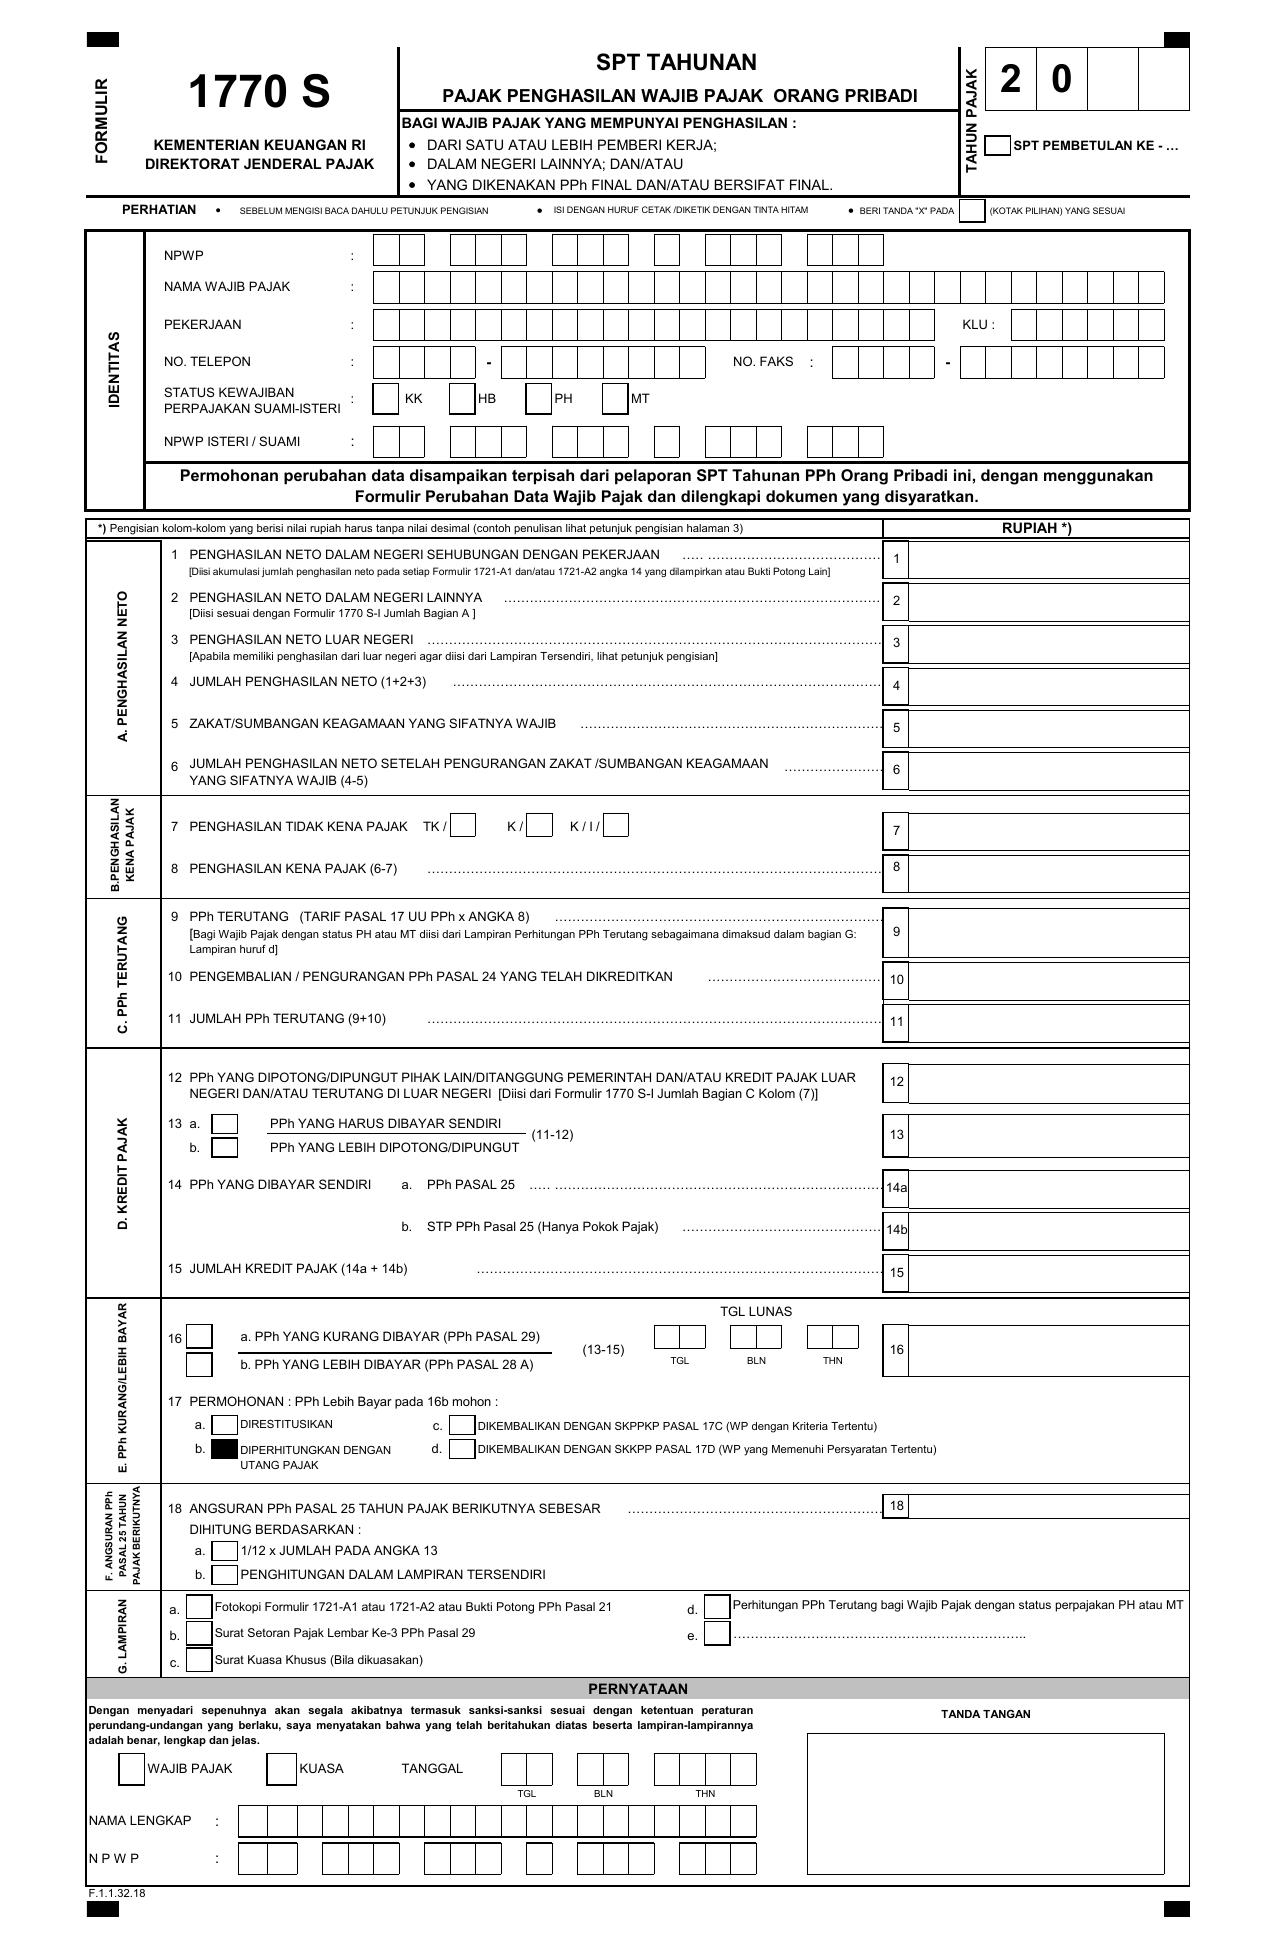 Formulir Spt 1770 S 2014